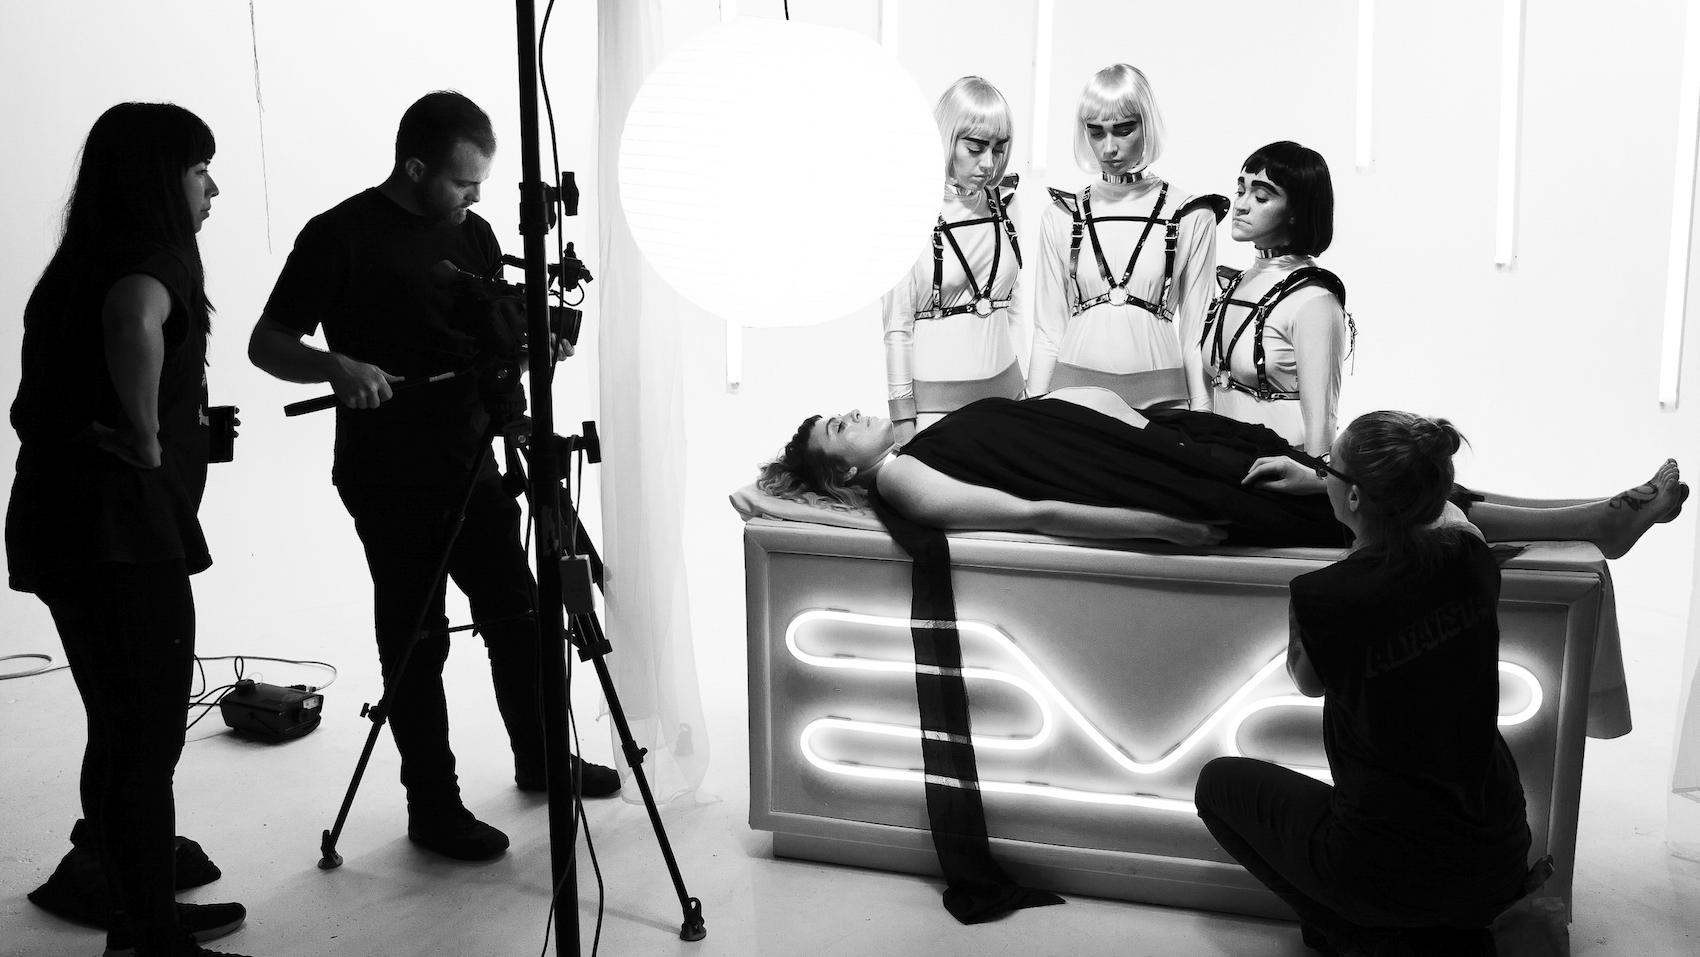 Behind the scenes on Troller's music video #shotbyoriginator